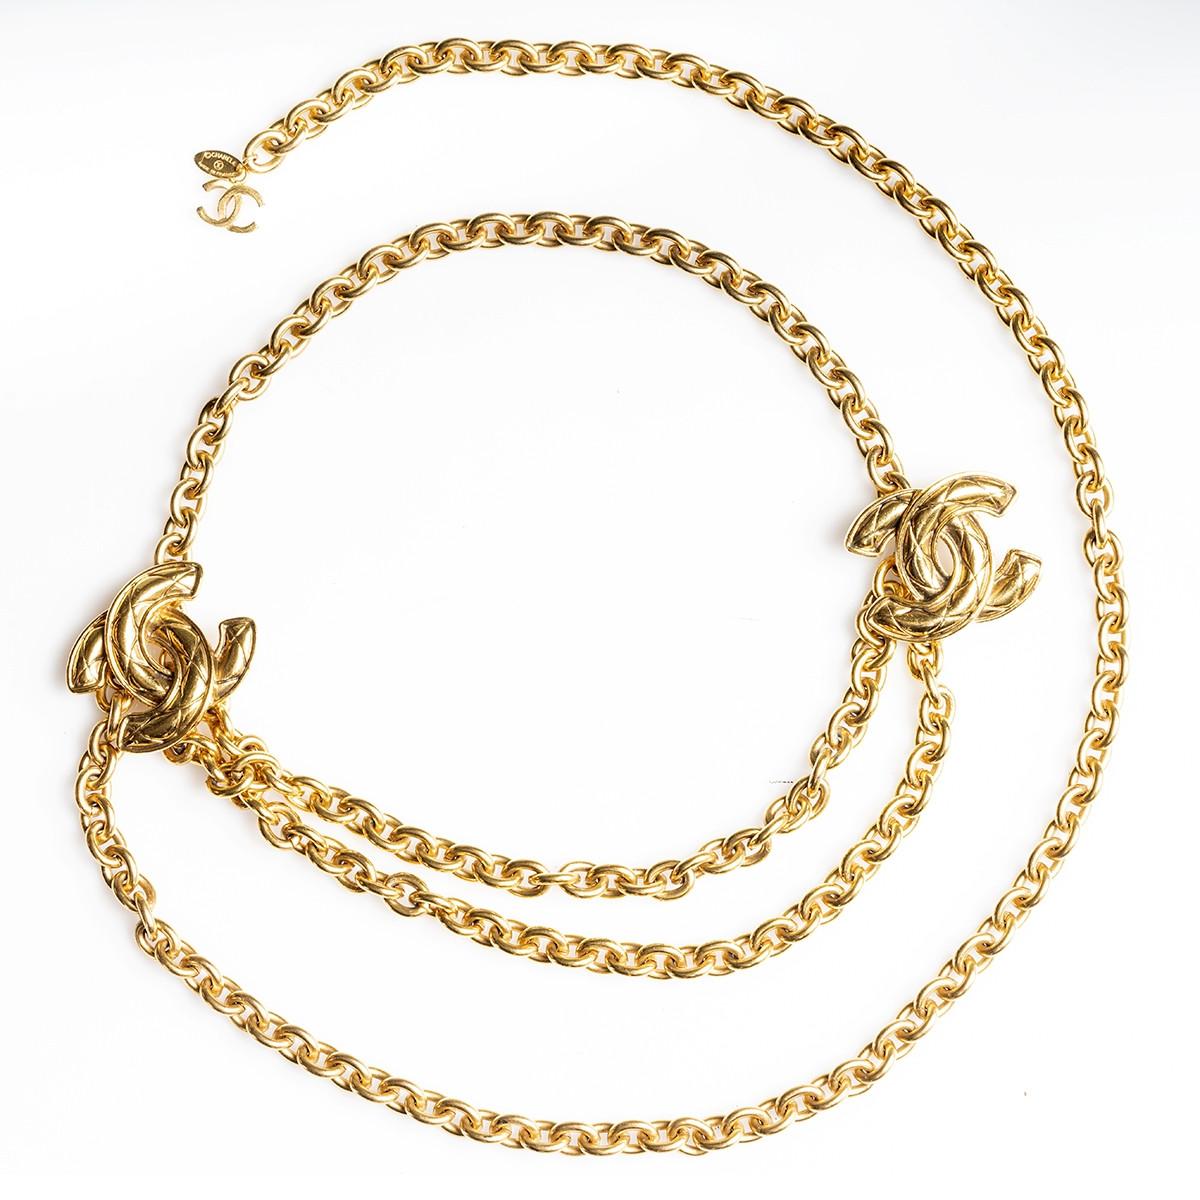 Vintage Chanel CC Chain Belt